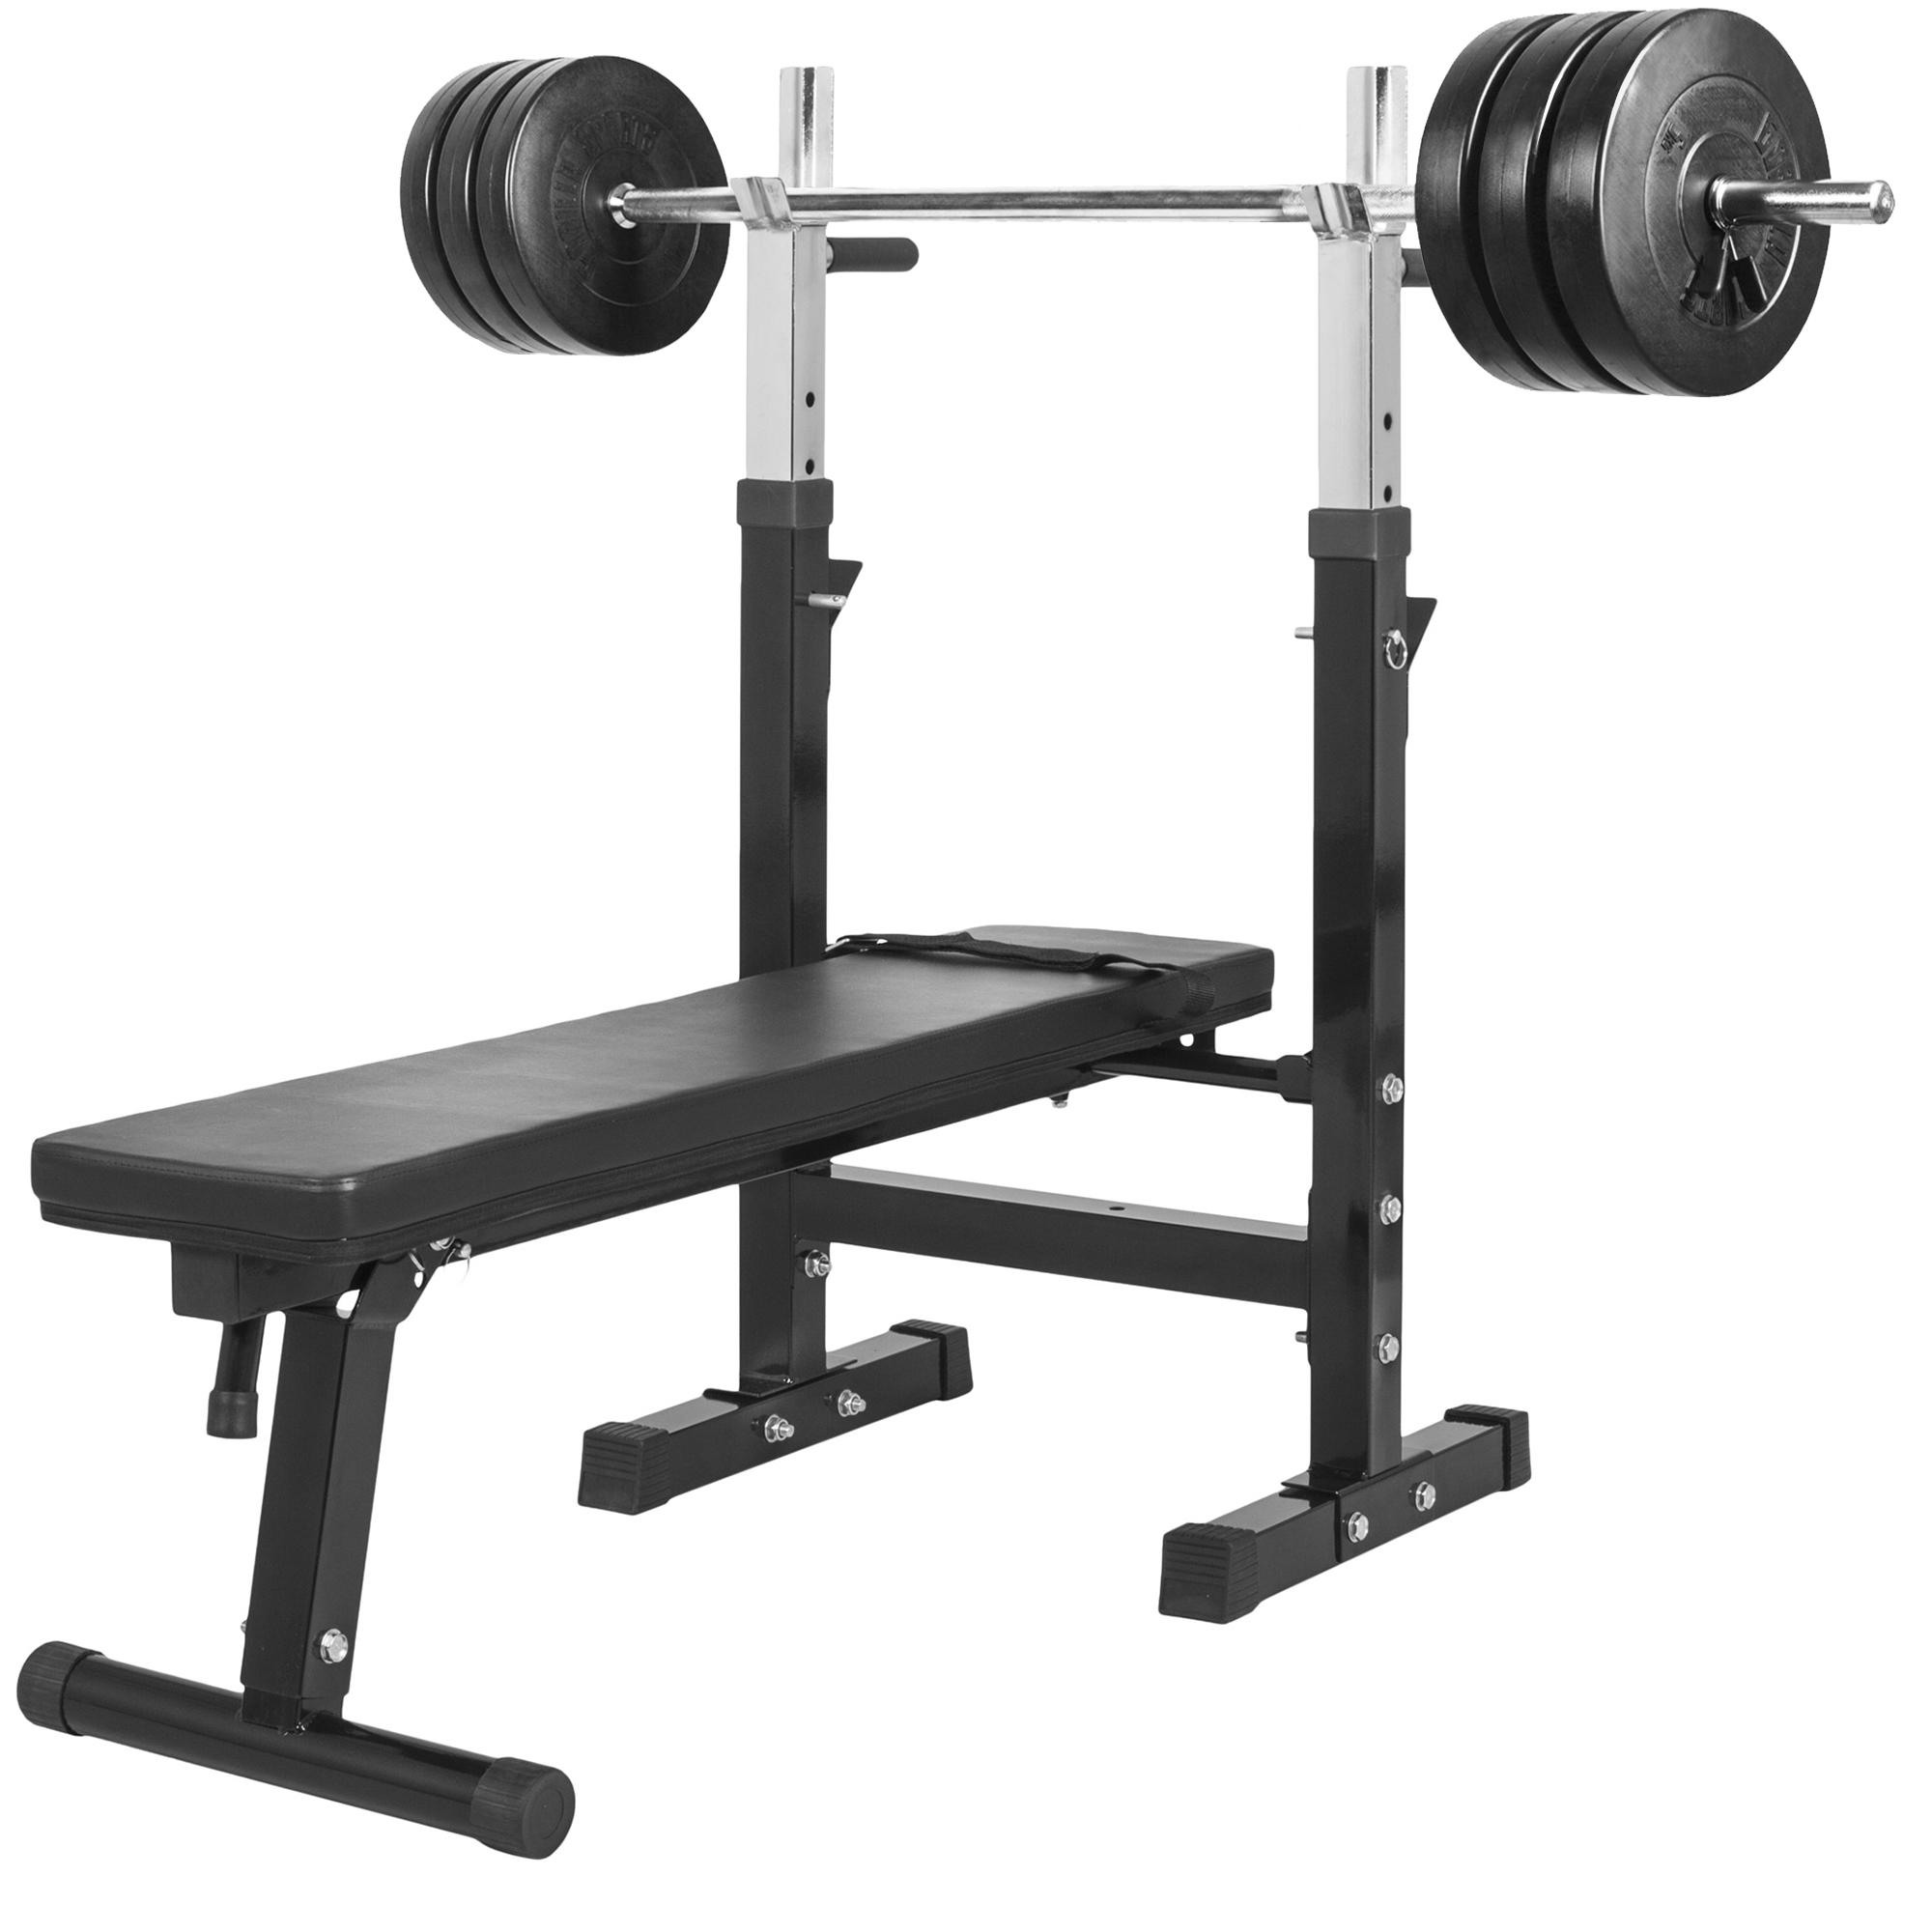 Gorilla Sports Hantelbank mit Langhantelset 38 kg 100421-00006-0038